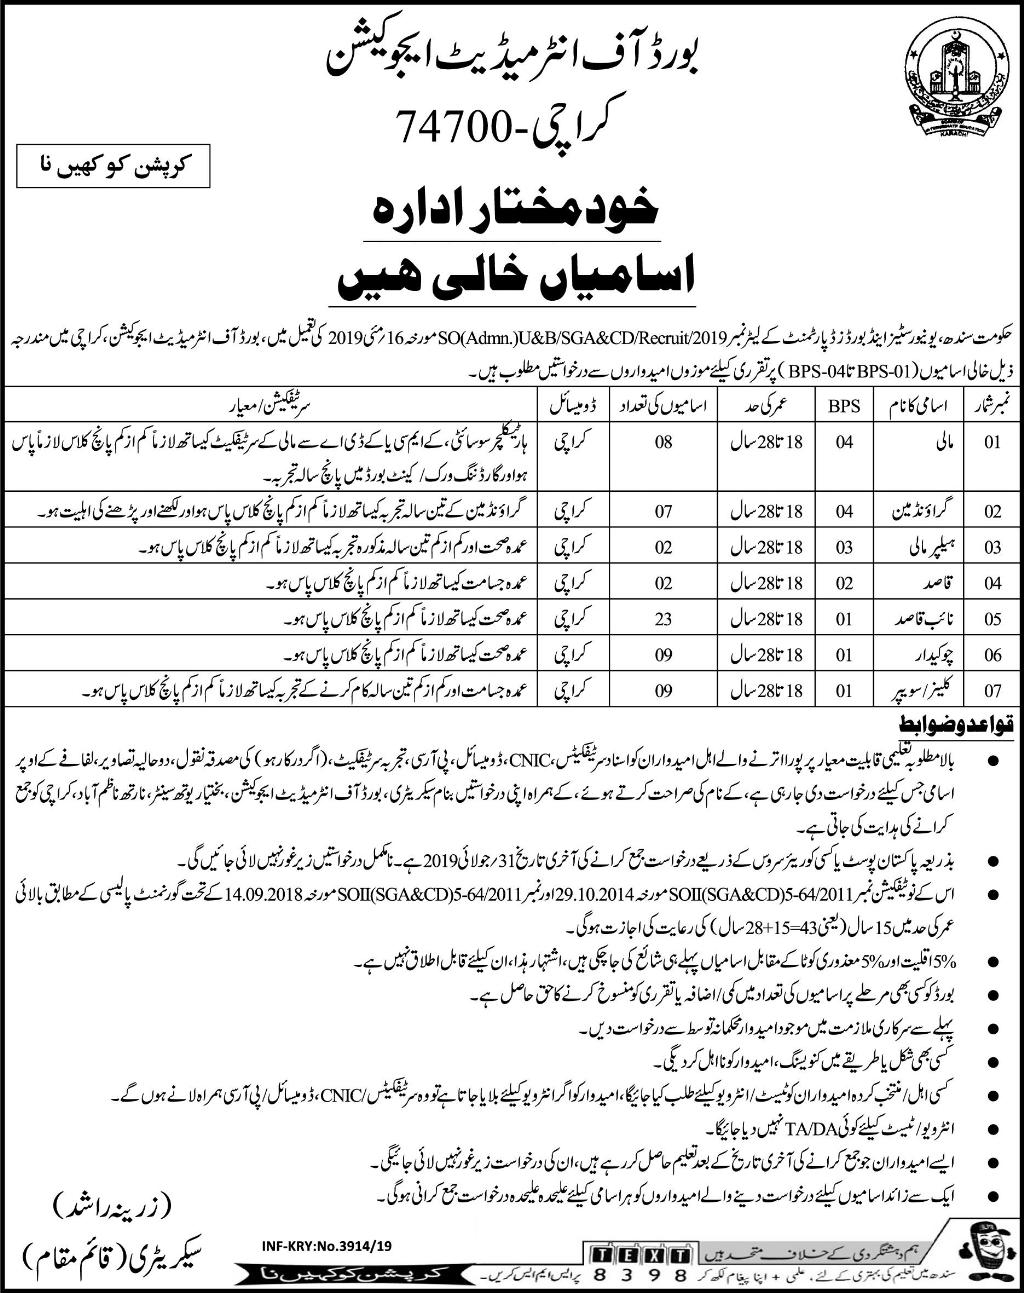 Board of Intermediate Education Jobs 2019 Latest Karachi